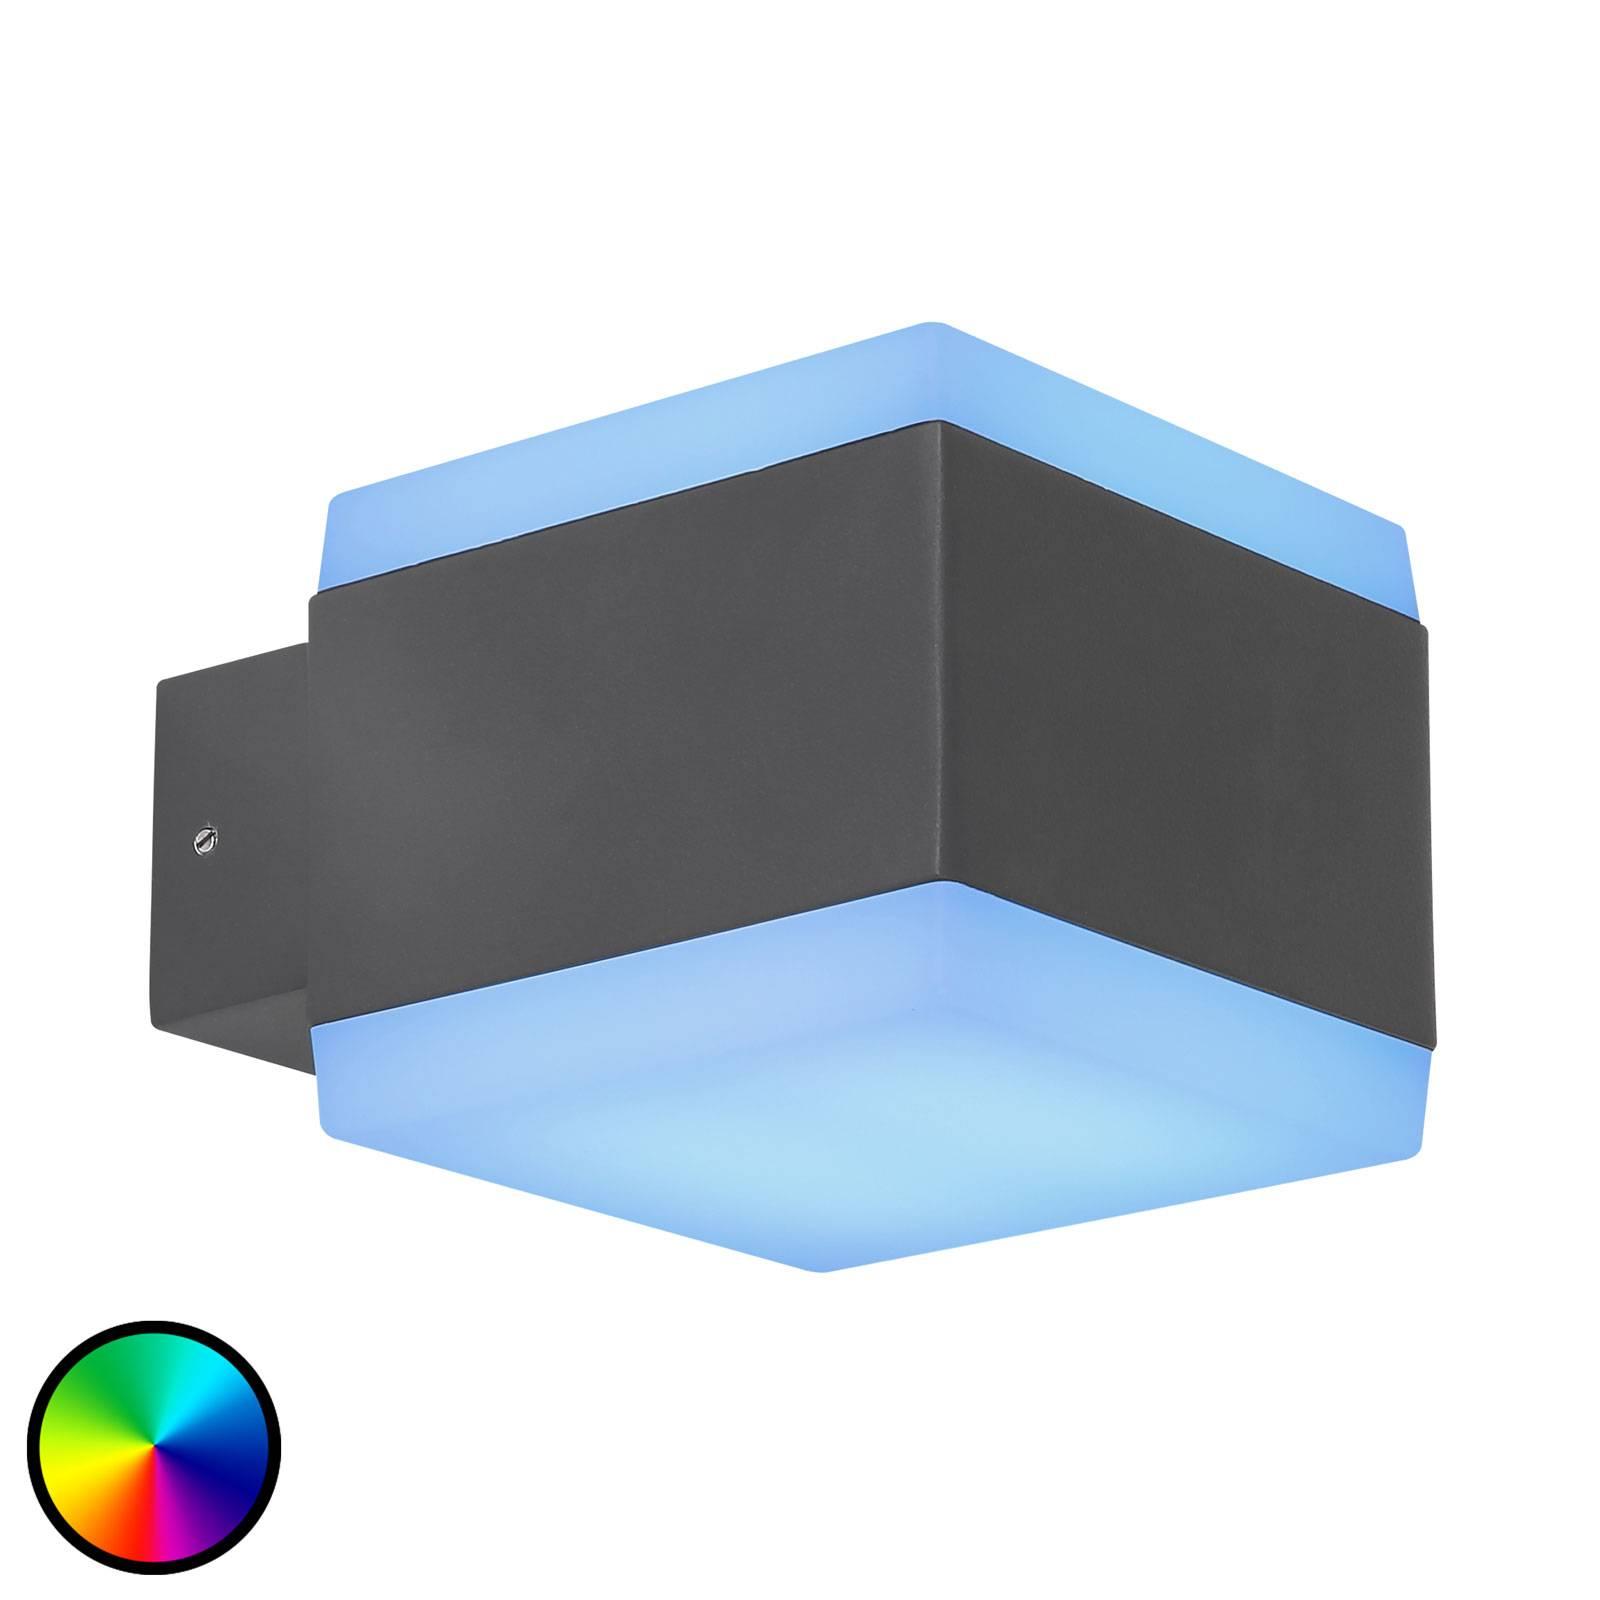 LED-ulkoseinälamppu Slice Tuya-Smart RGBW CCT